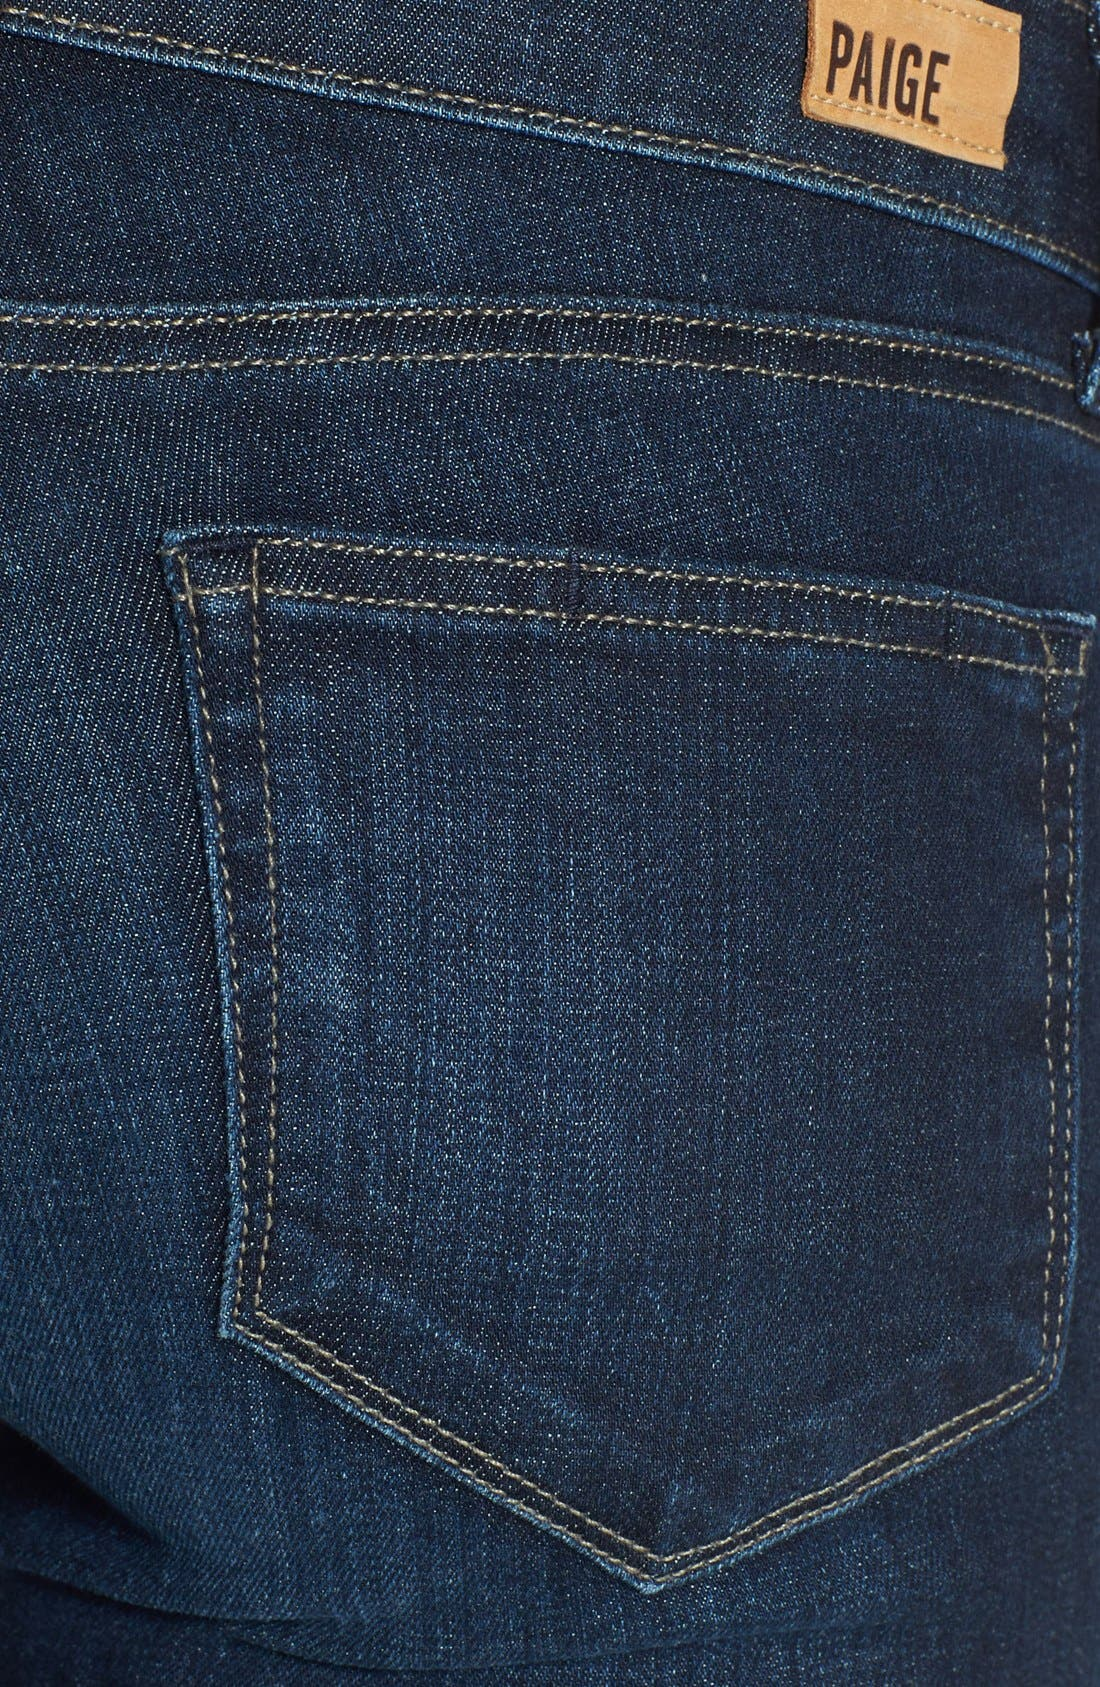 Alternate Image 3  - Paige Denim 'Manhattan' Baby Bootcut Jeans (Trinity)